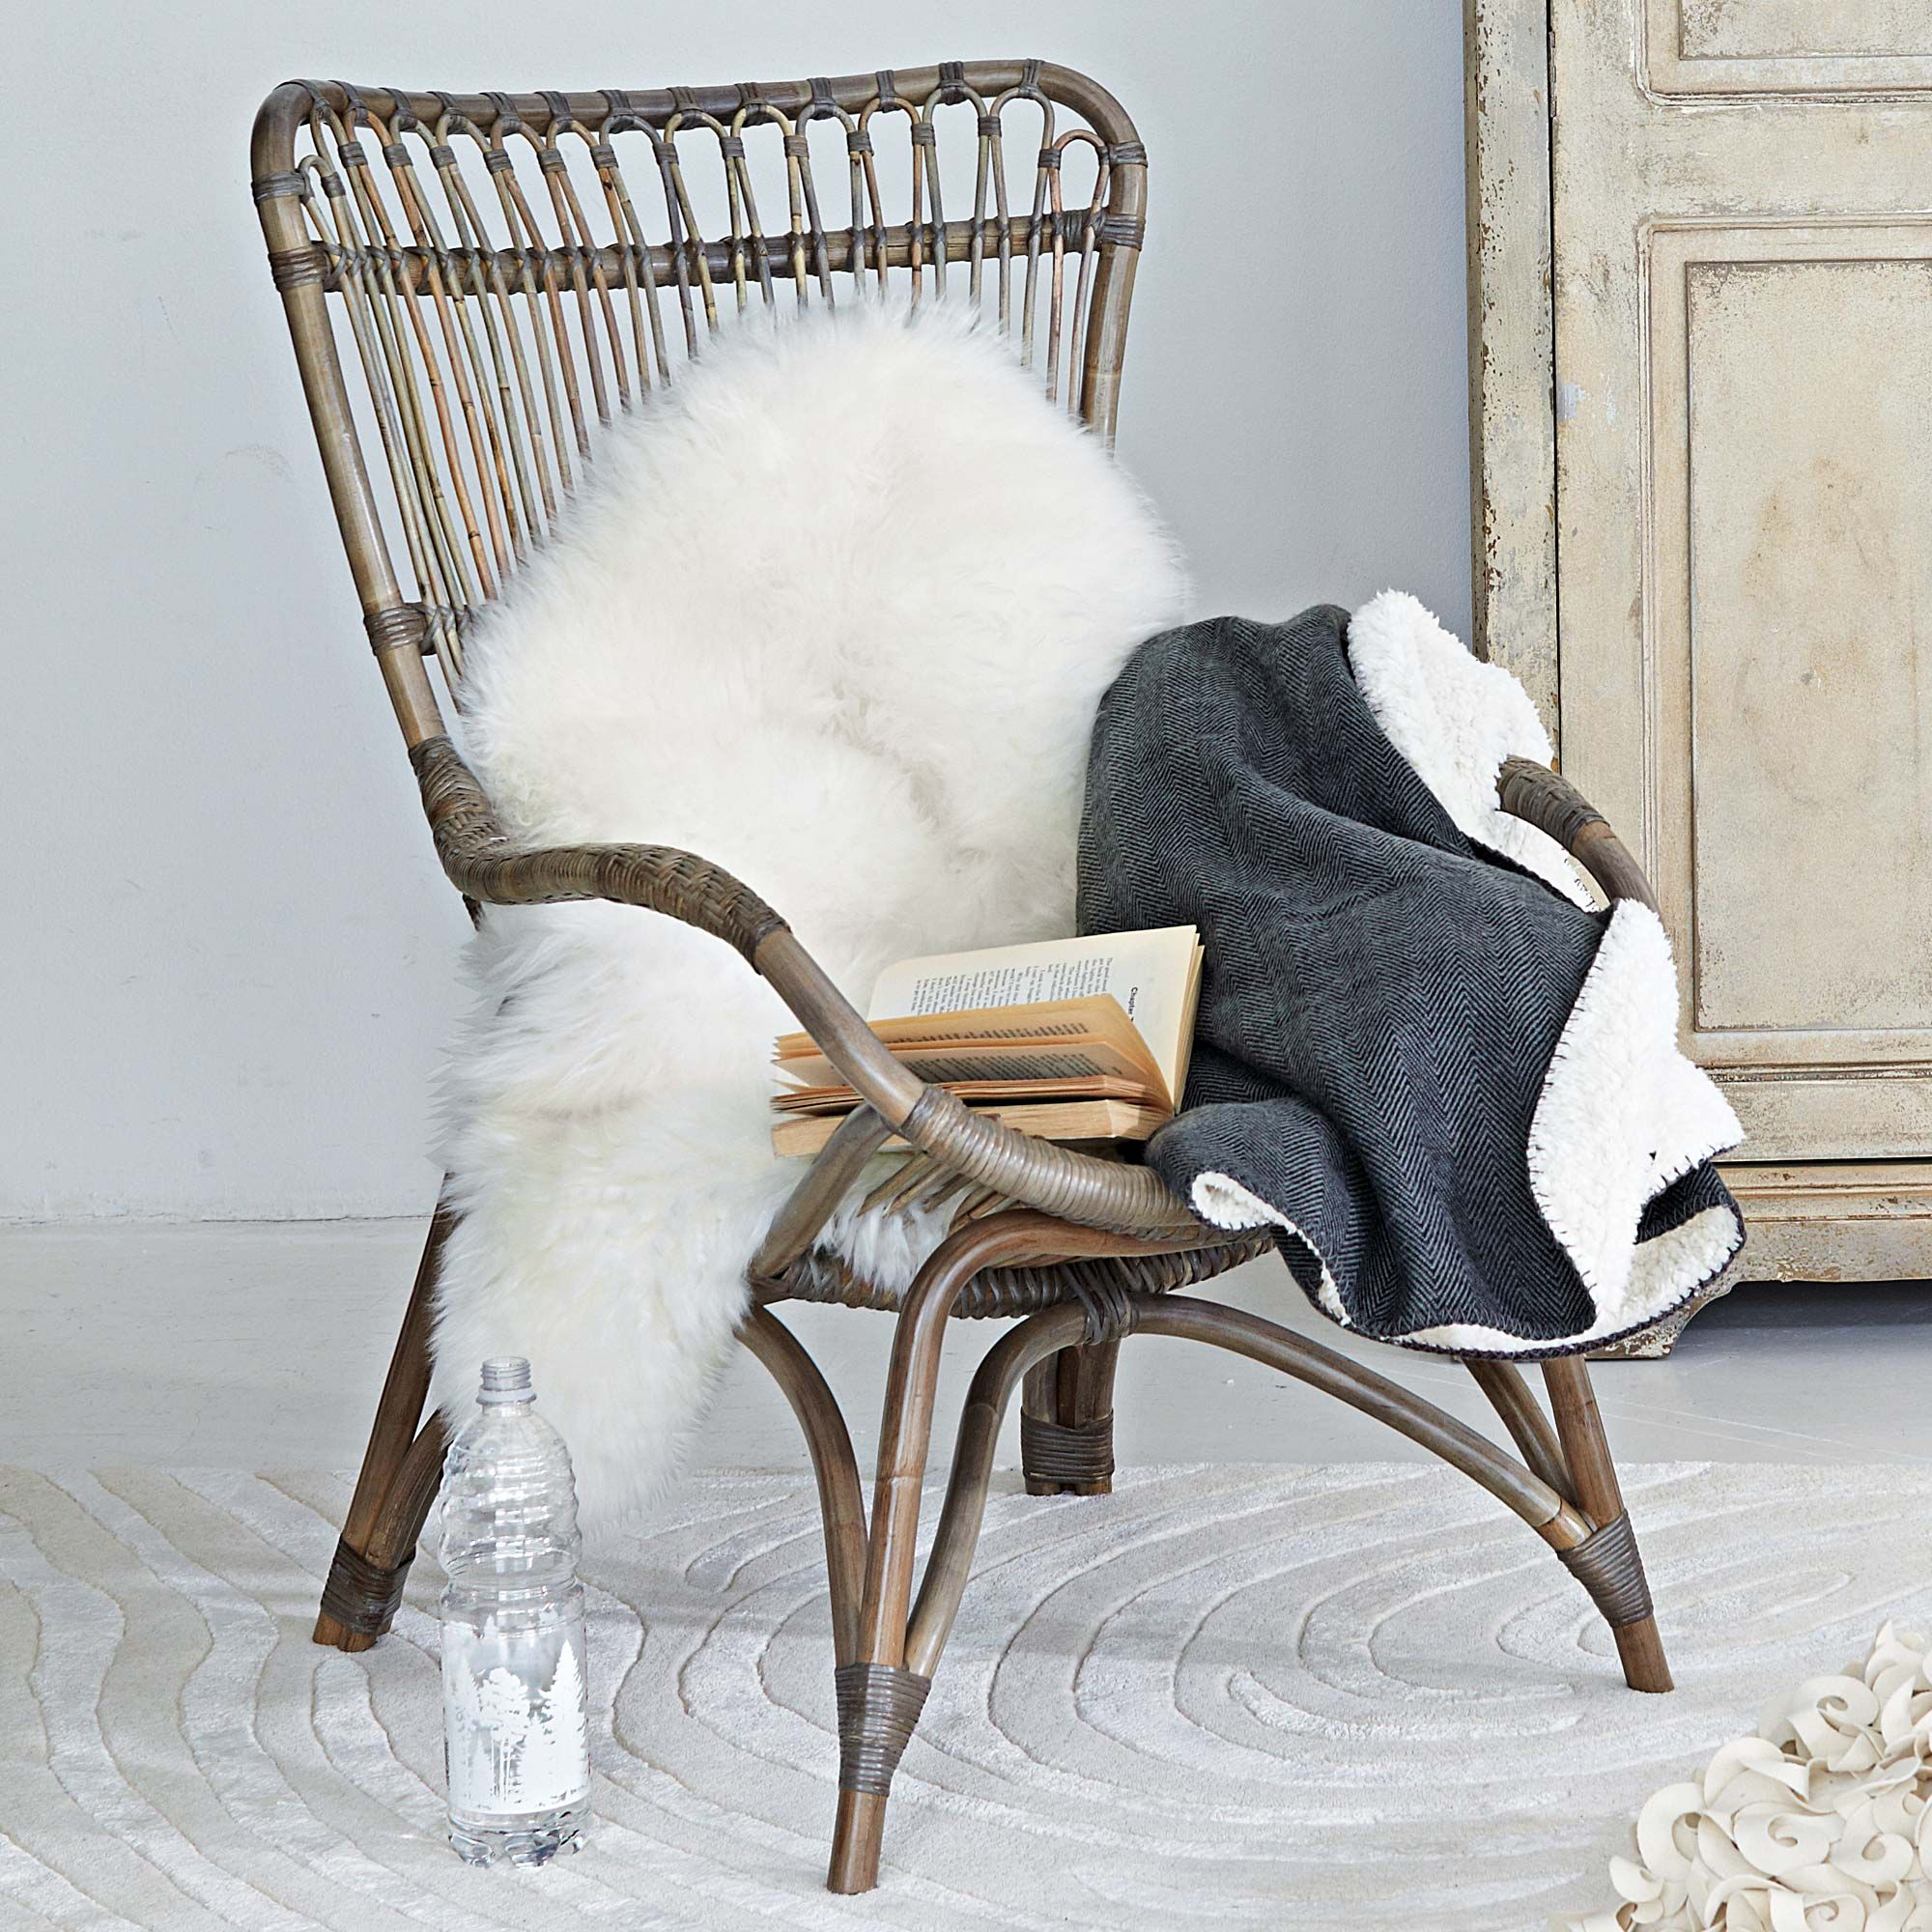 Bamboo Furniture Online Shopping